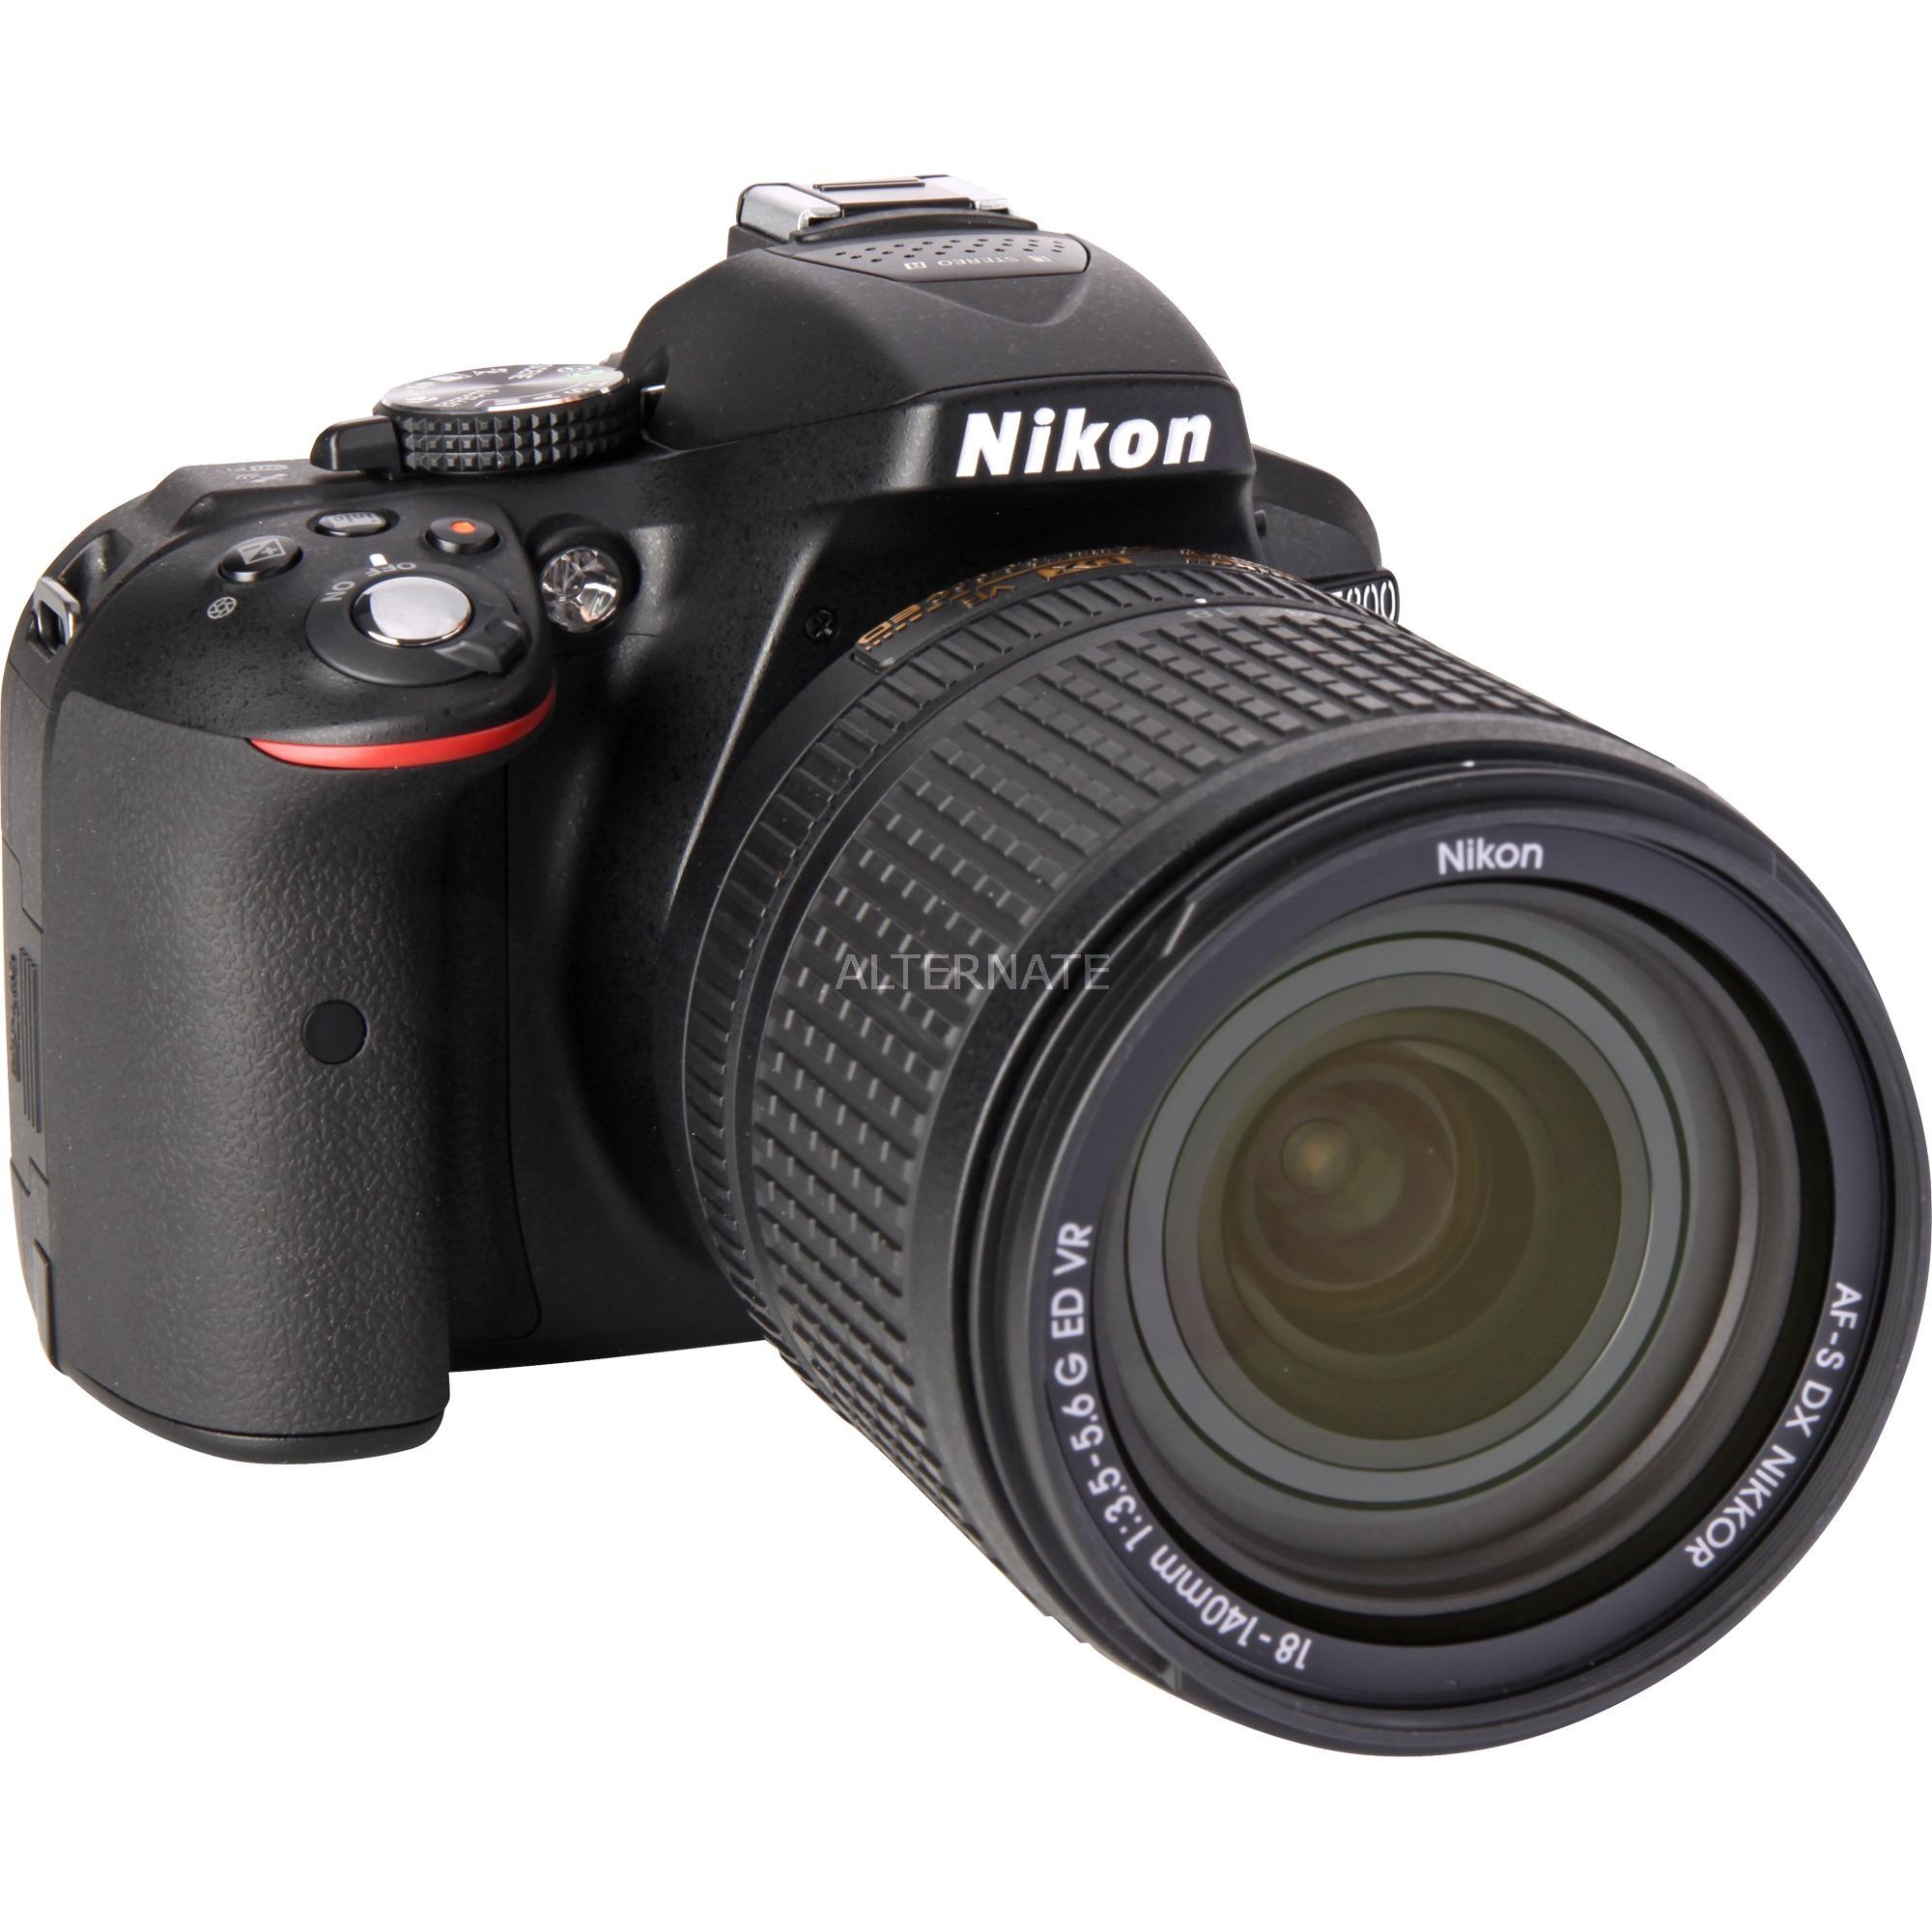 D5300 + AF-S DX NIKKOR 18-140mm VR Juego de cámara SLR 24.2MP CMOS 6000 x 4000Pixeles Negro, Cámara digital